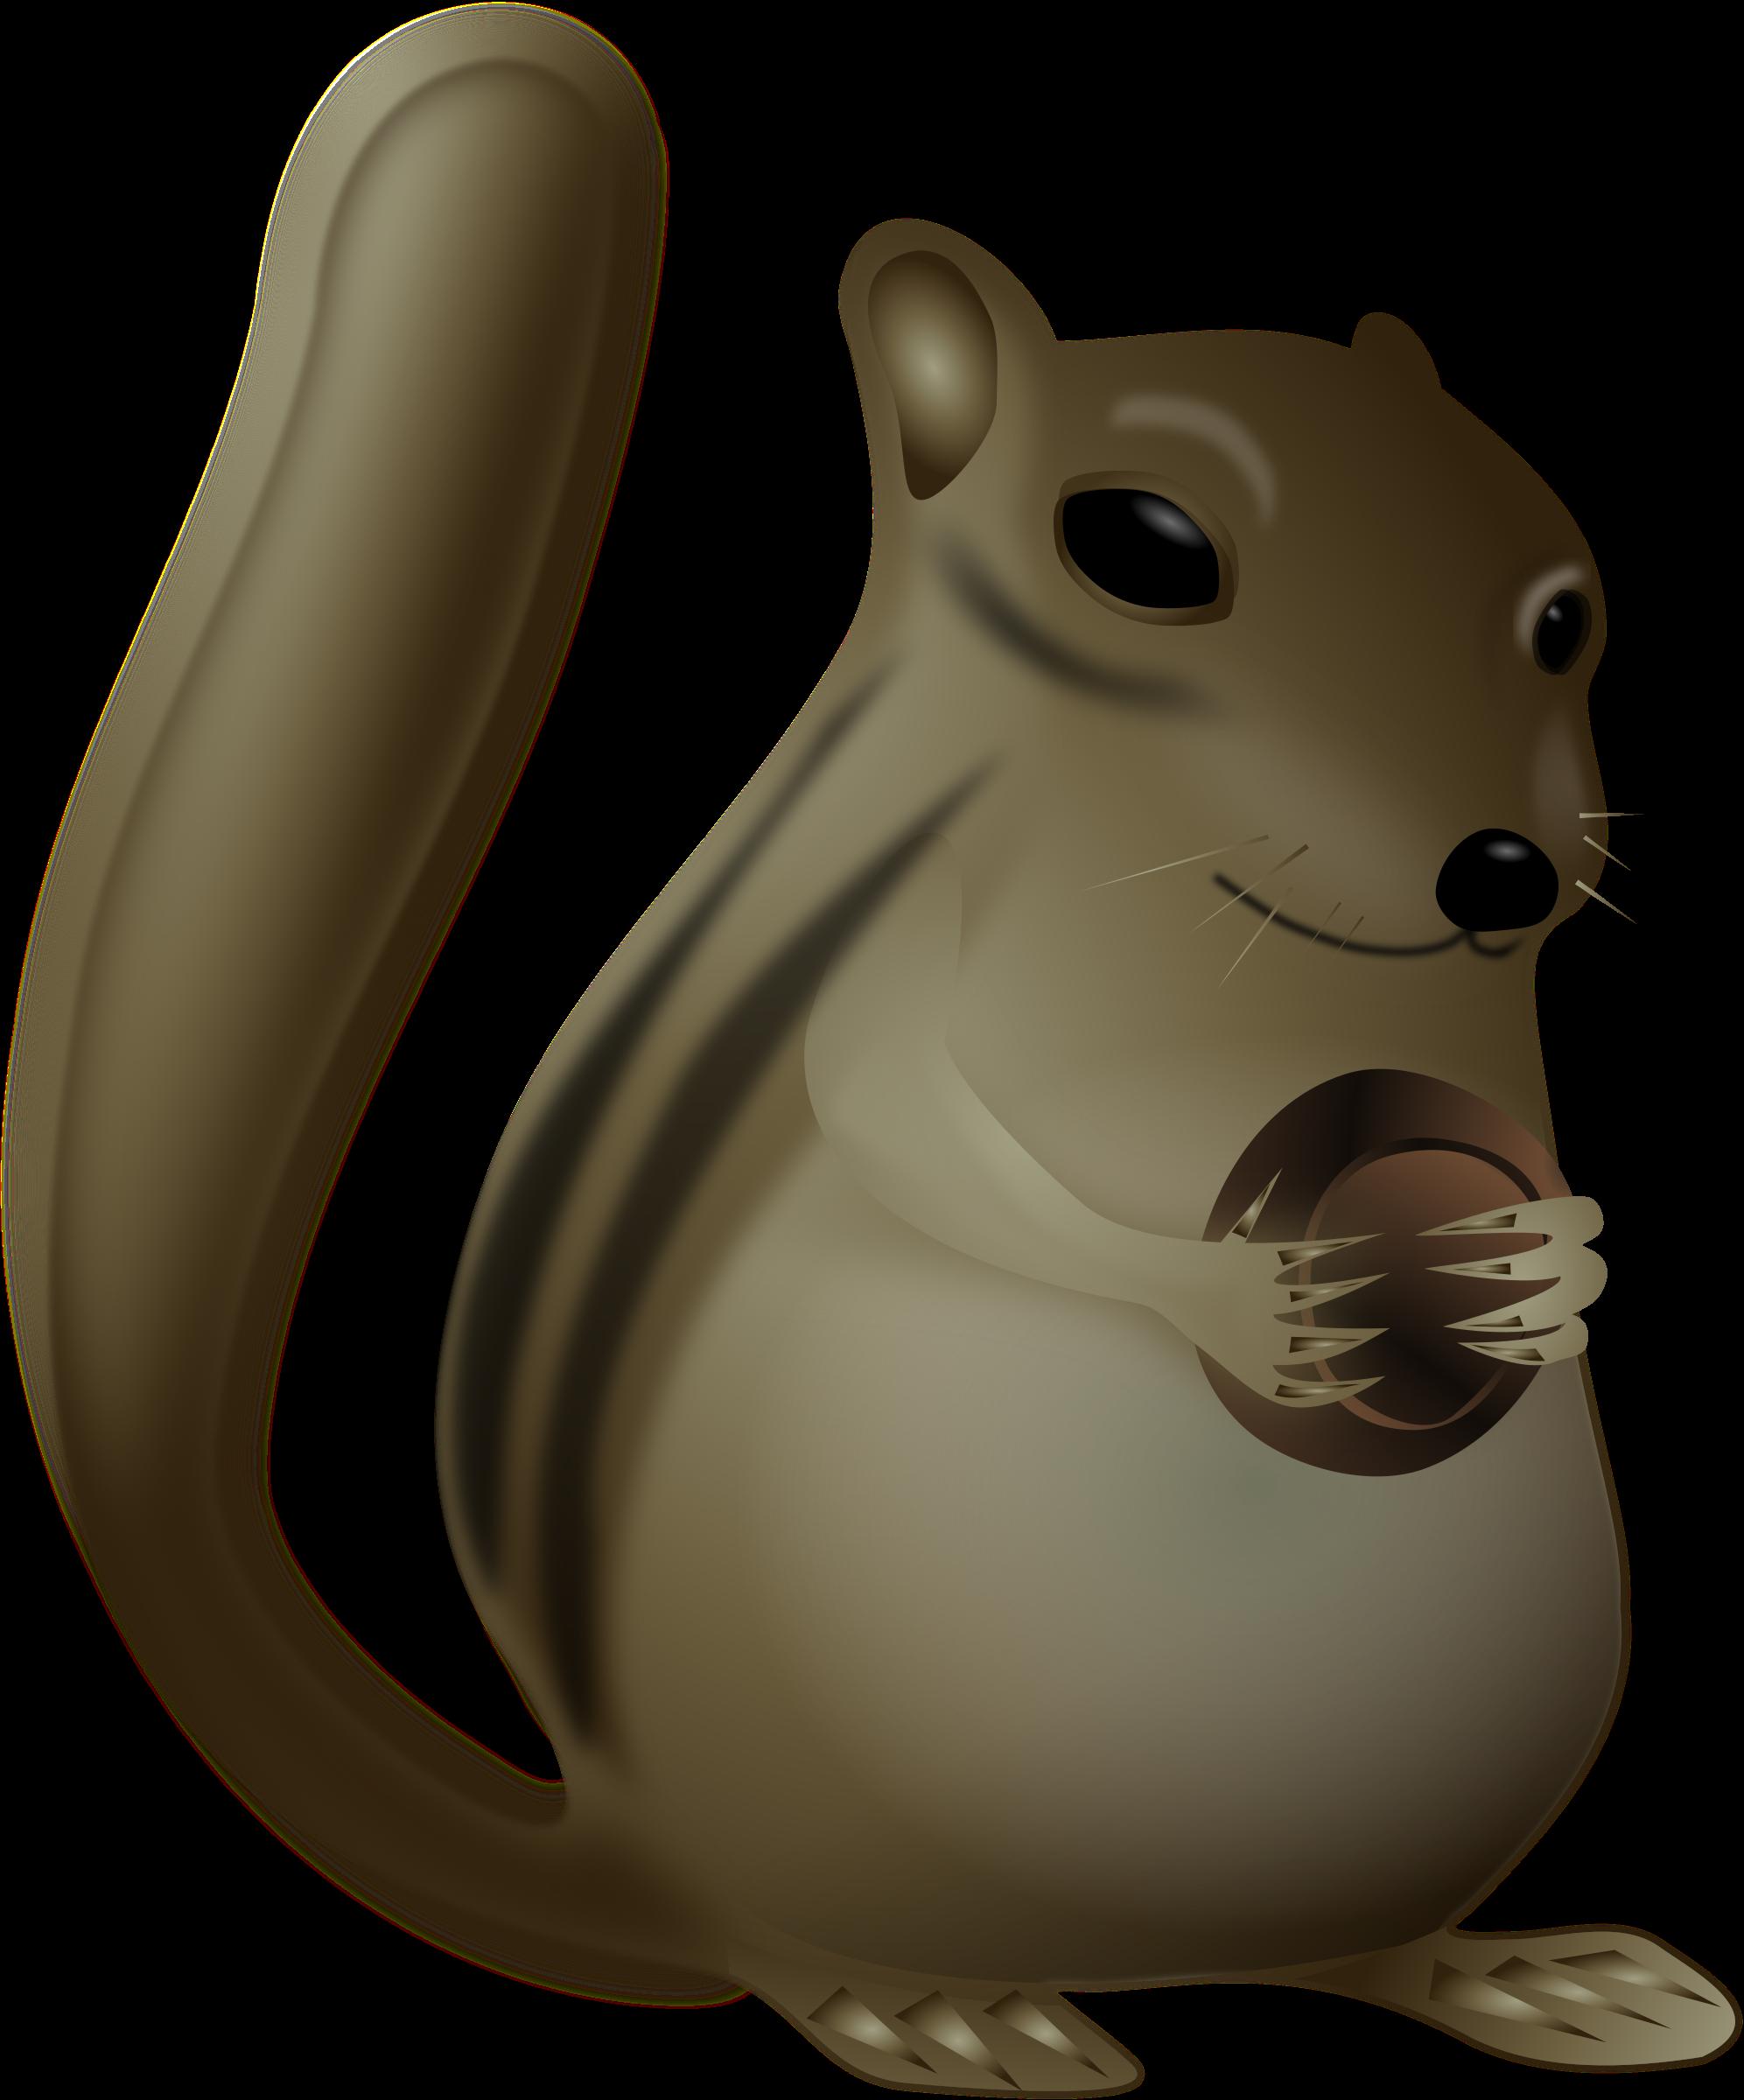 Chipmunk very big image. Fat clipart sad